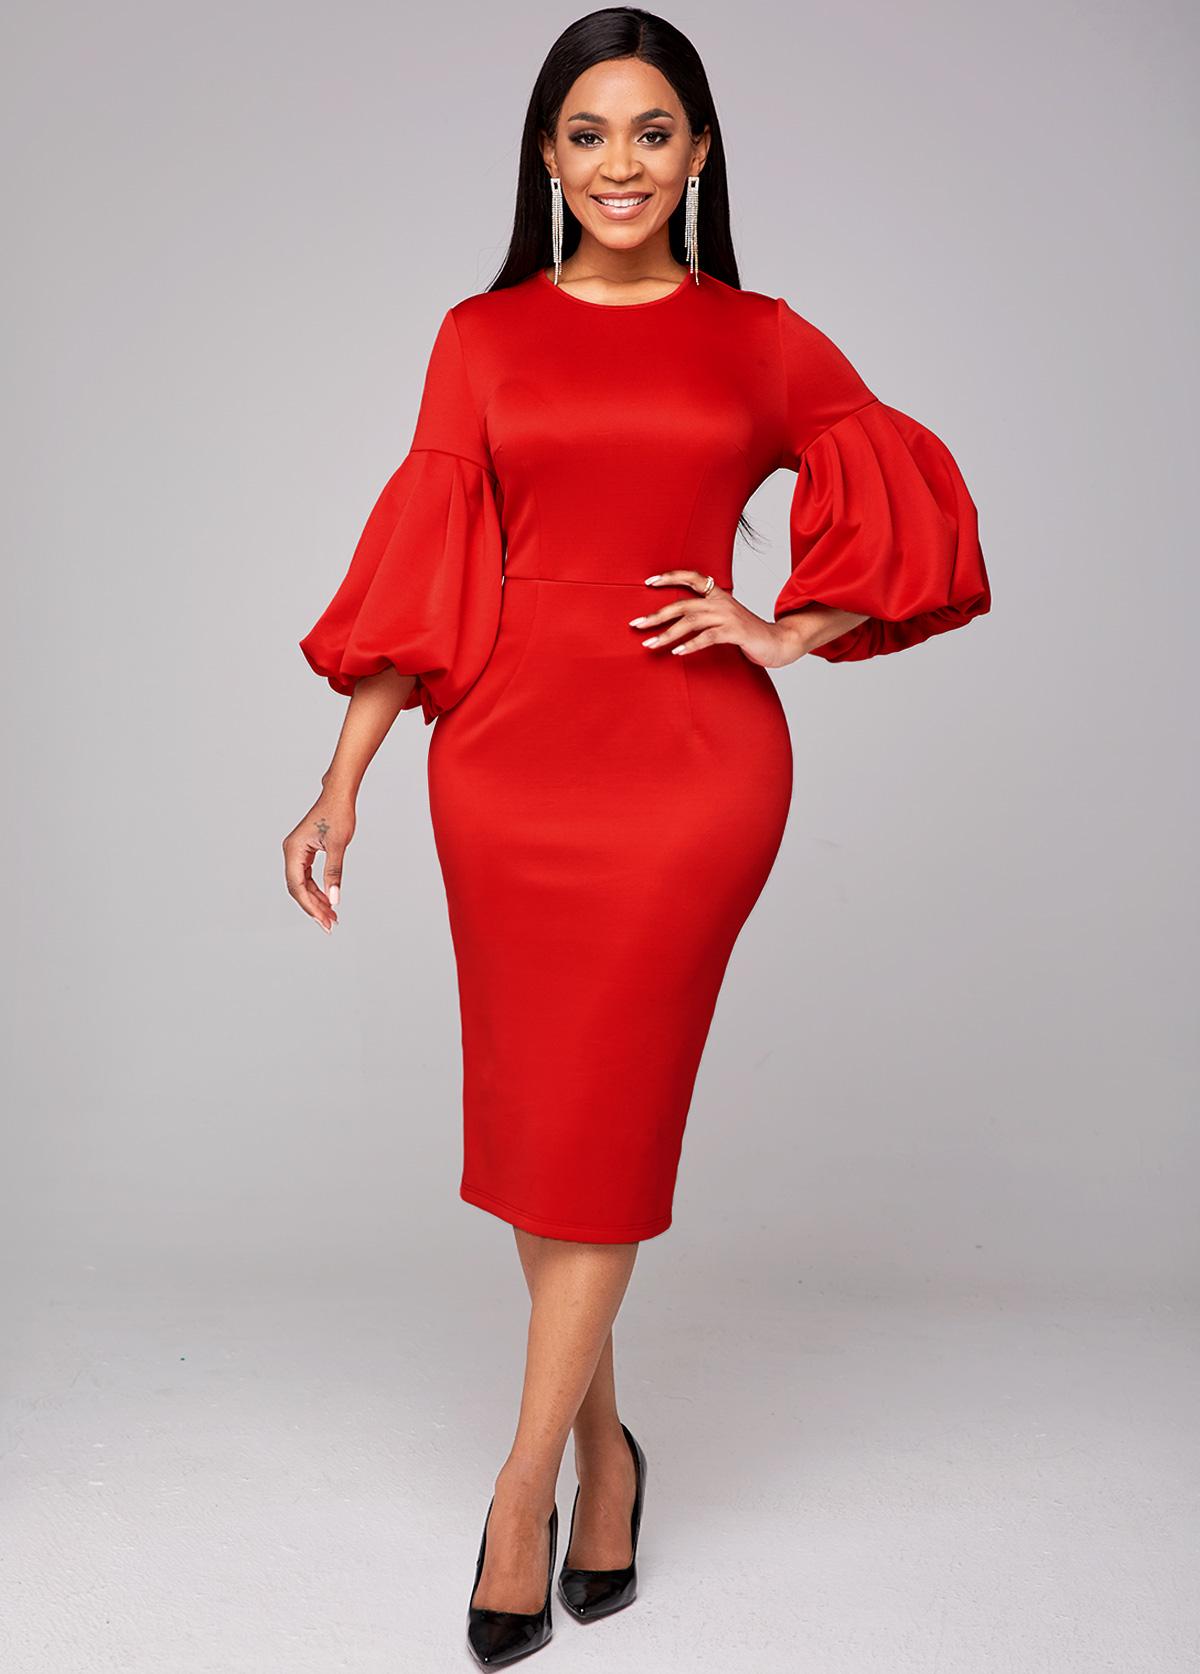 ROTITA Puff Sleeve Round Neck Red Bodycon Dress